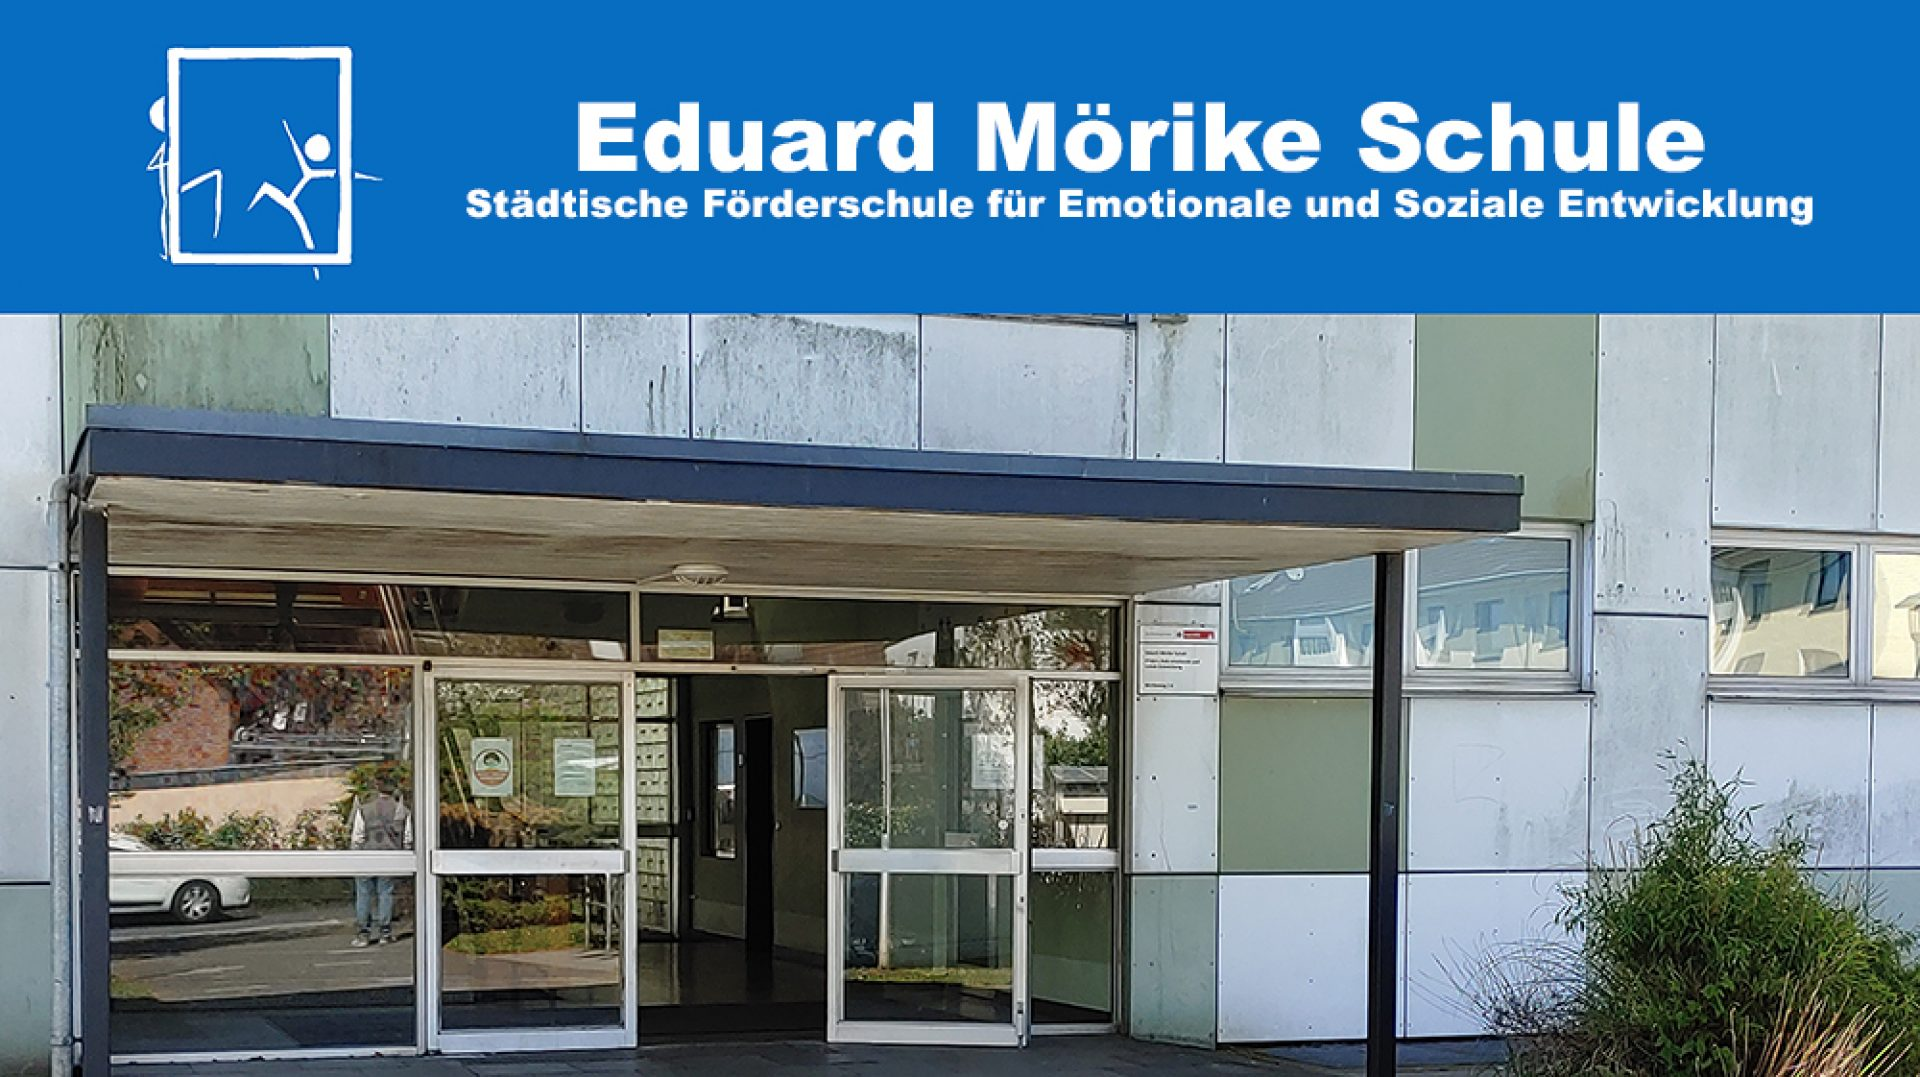 Eduard Mörike Schule